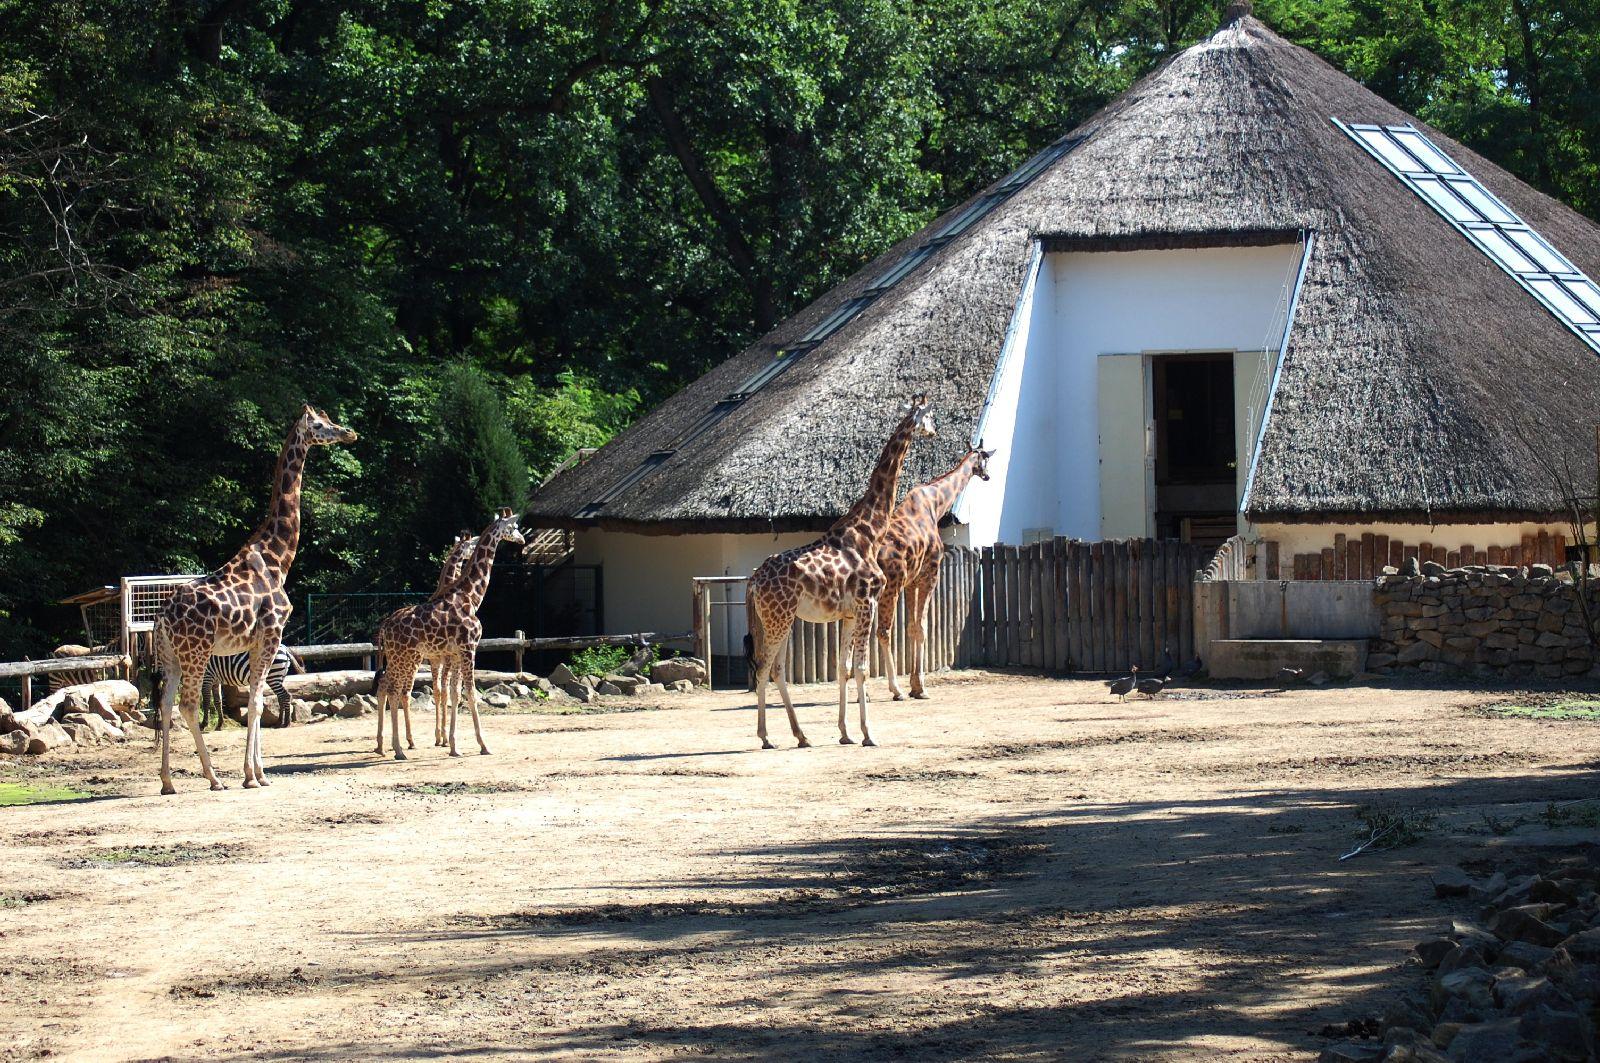 zoo-lesna-zlin-986-2